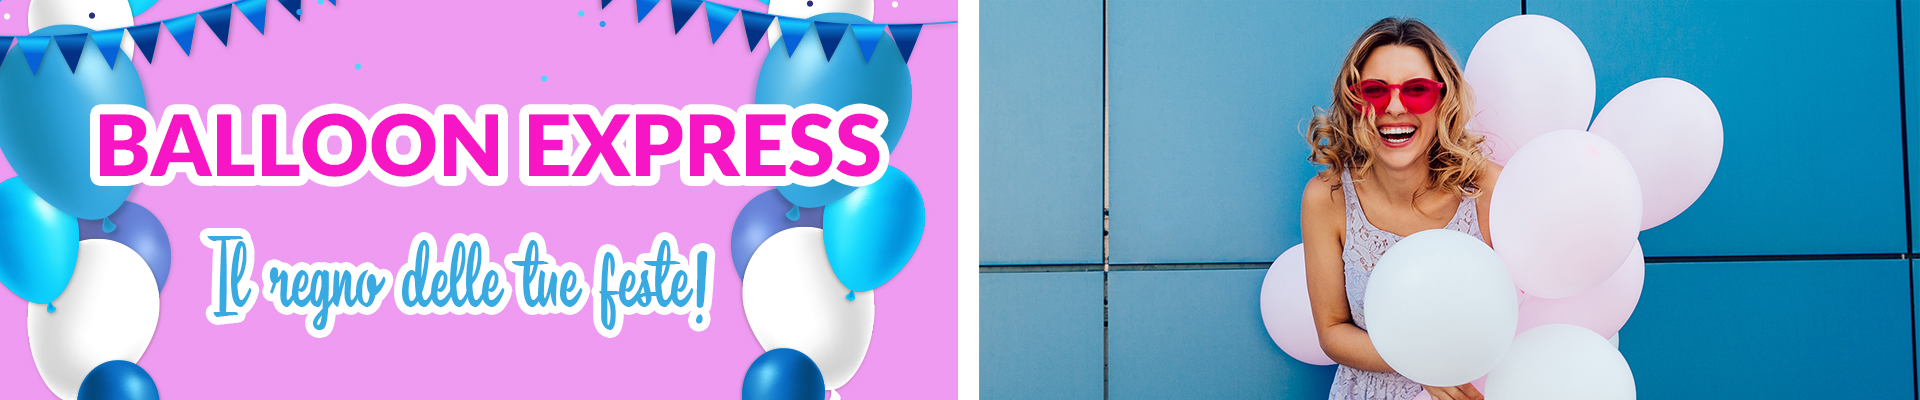 Slide Ballon Express 1